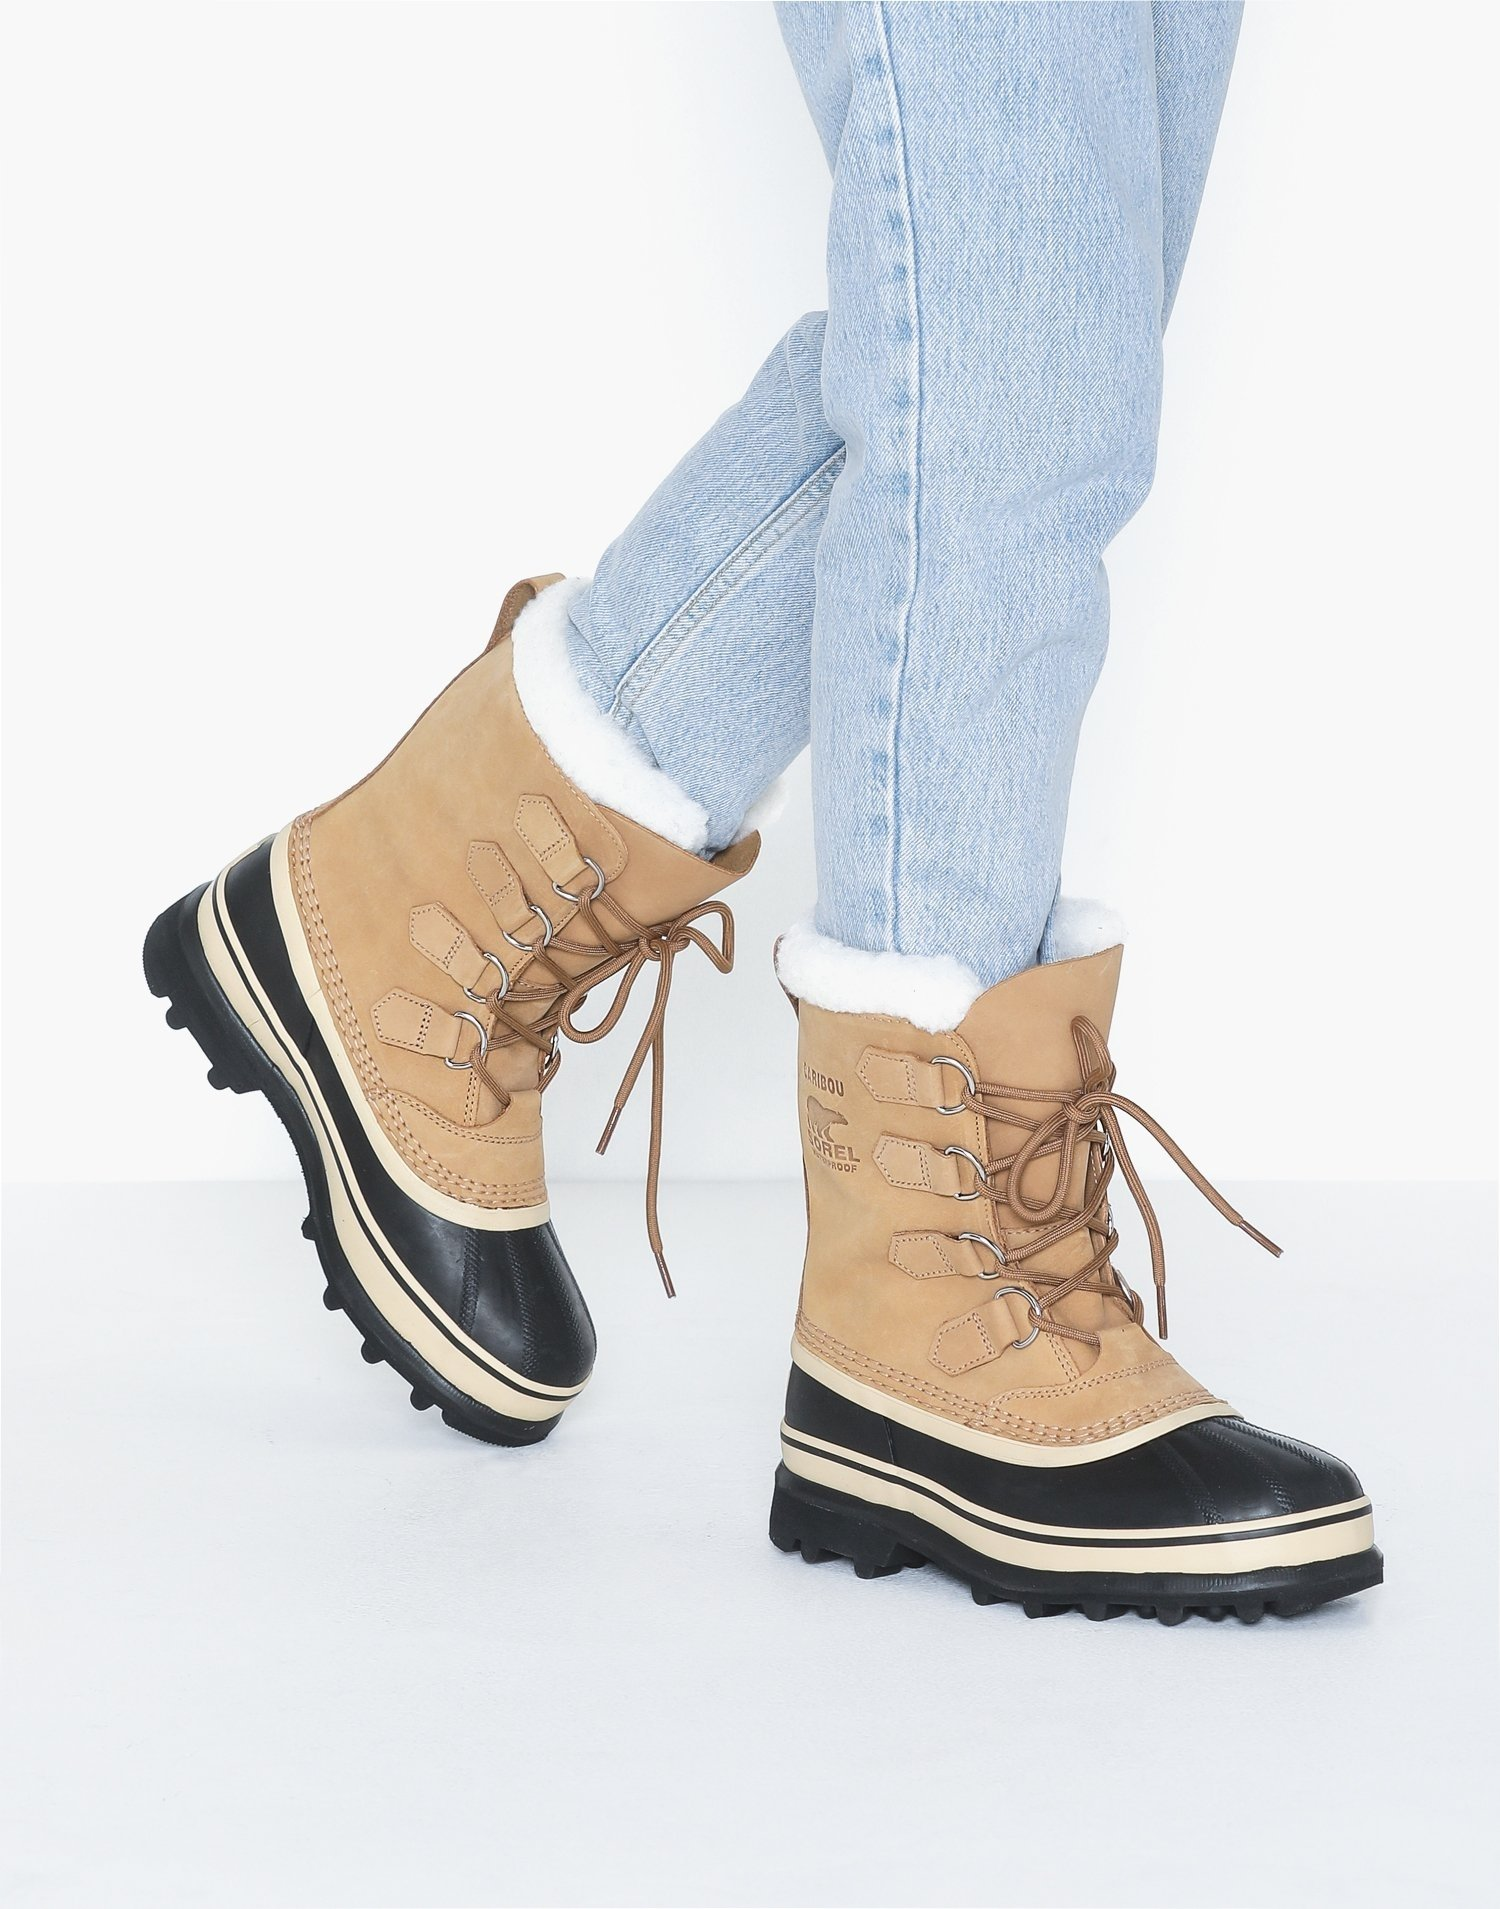 Blackstone Vinterstøvler Damer Brun Sko Støvler Billigste